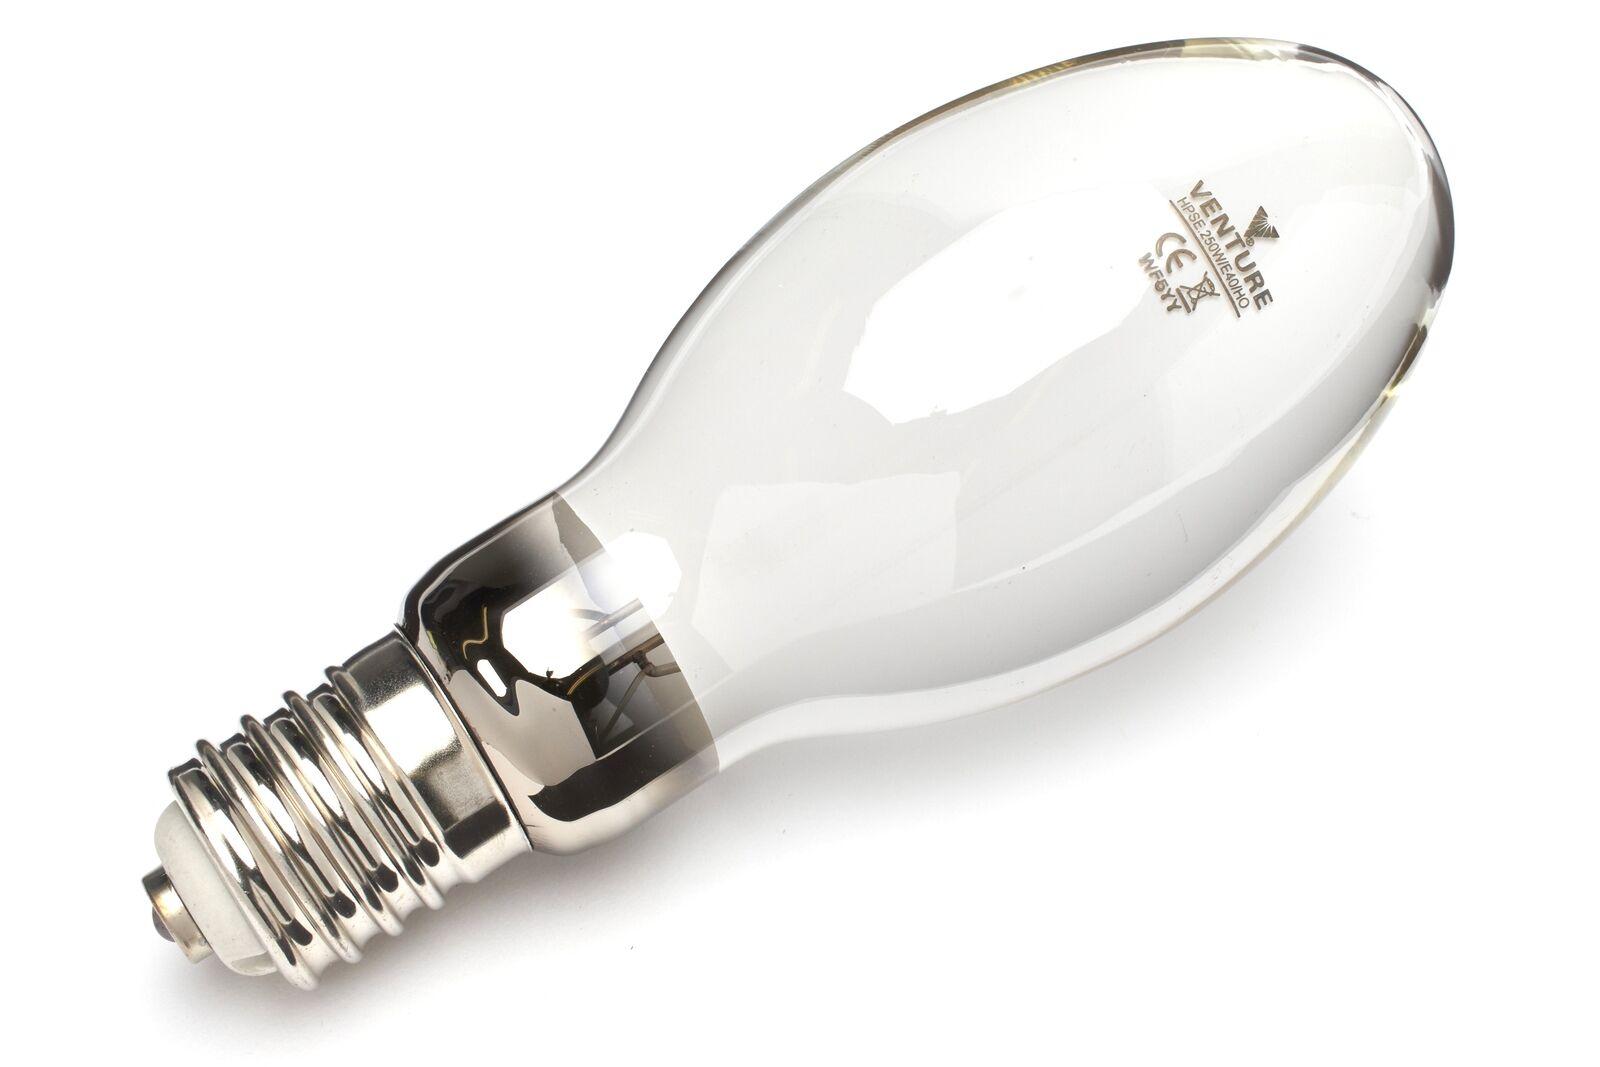 5x 150w Son T Externo Encendedor Alta Salida- Lámpara HPS Tubular E40 Ges